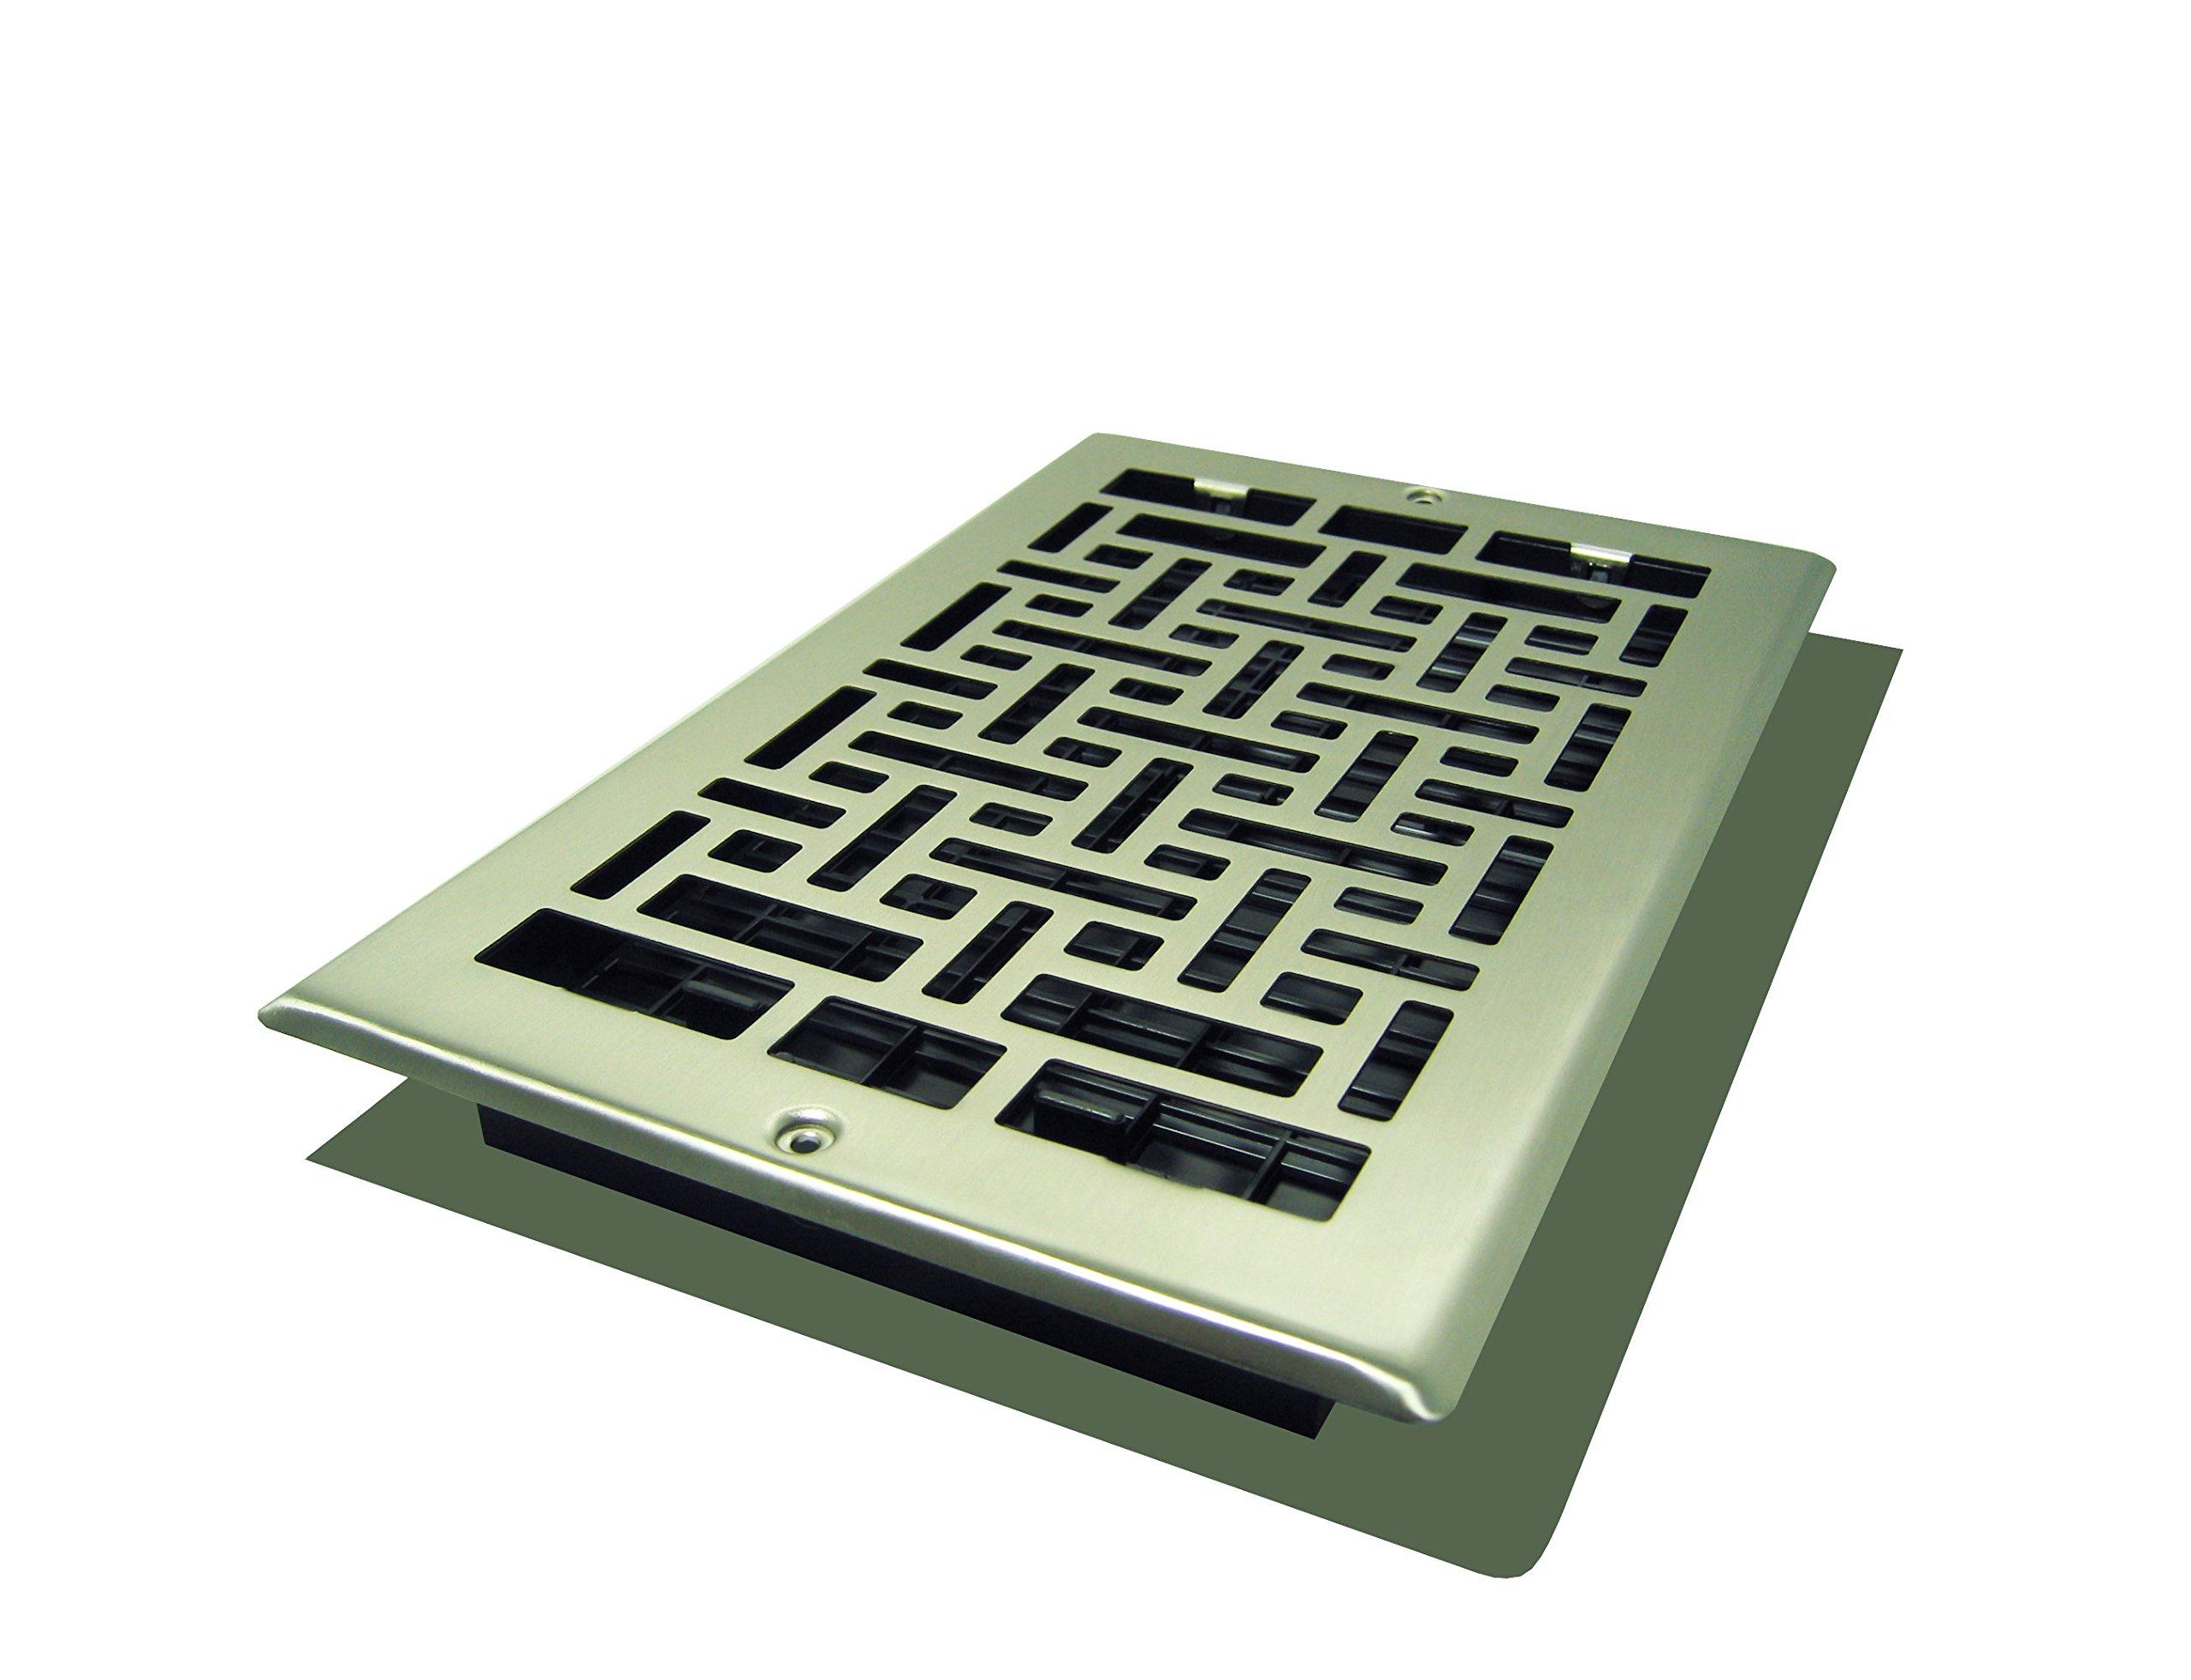 Decor Grates AJL610W-NKL Oriental Wall Register, 6-Inch by 10-Inch, Nickel